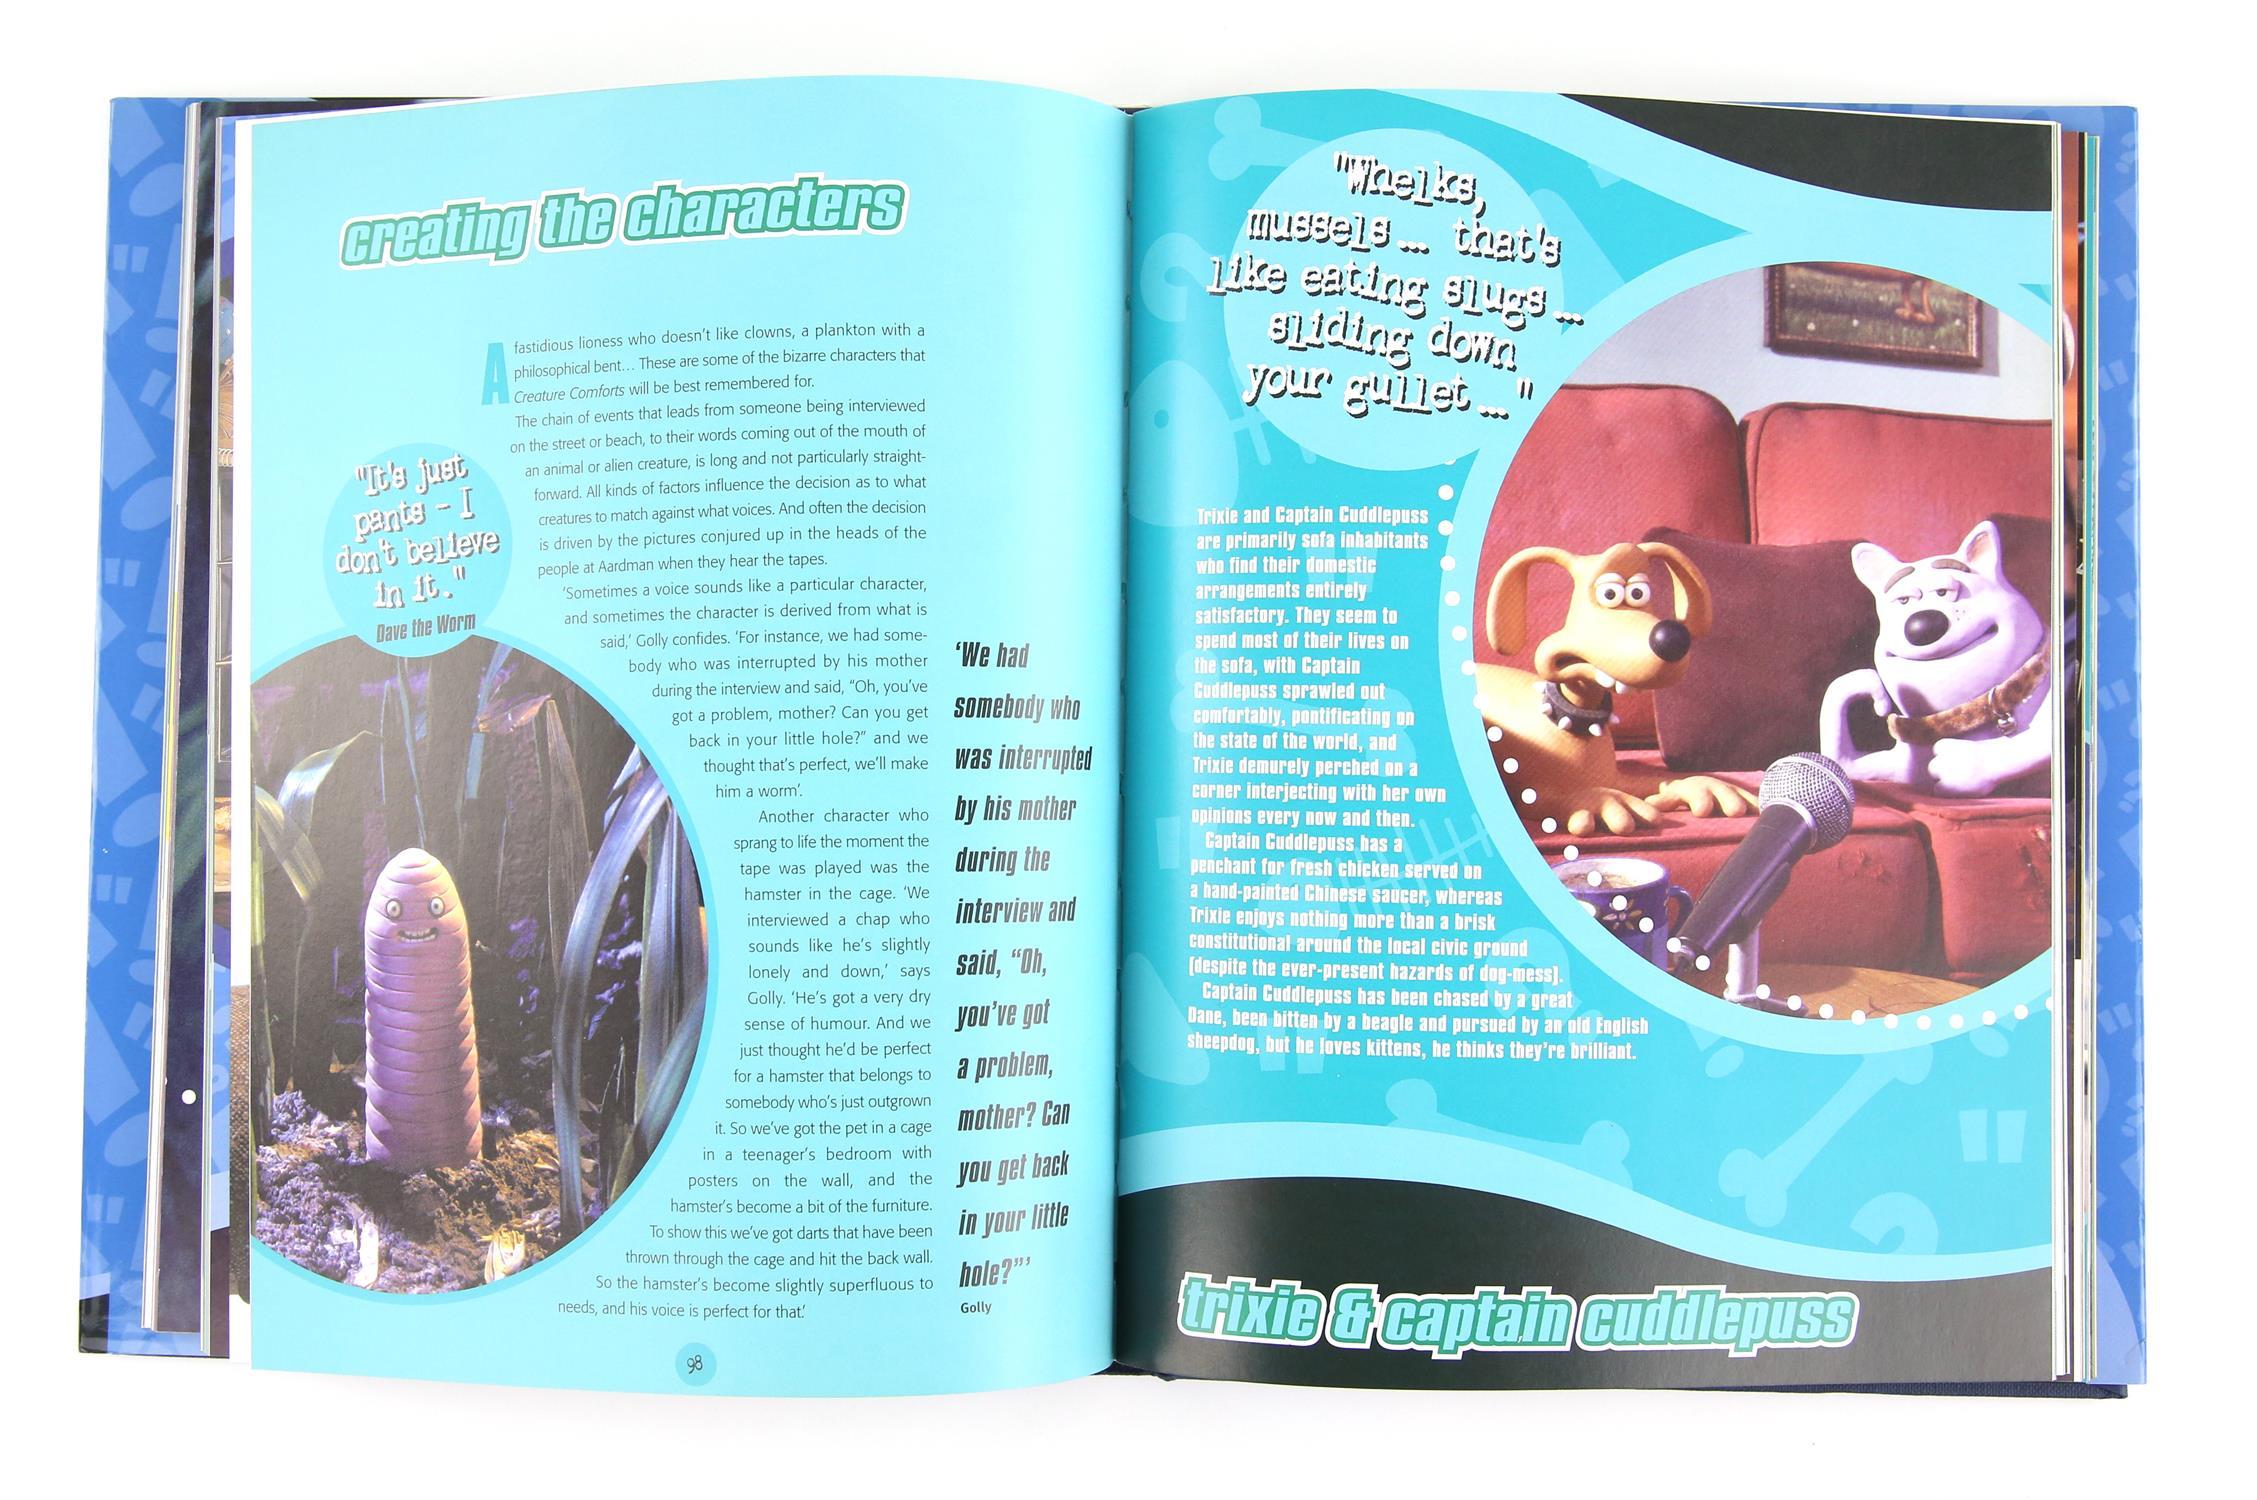 Creature Comforts - Aardman Animations - 'Creating Creature Comforts' - 2003 - Hardback book signed - Image 3 of 3